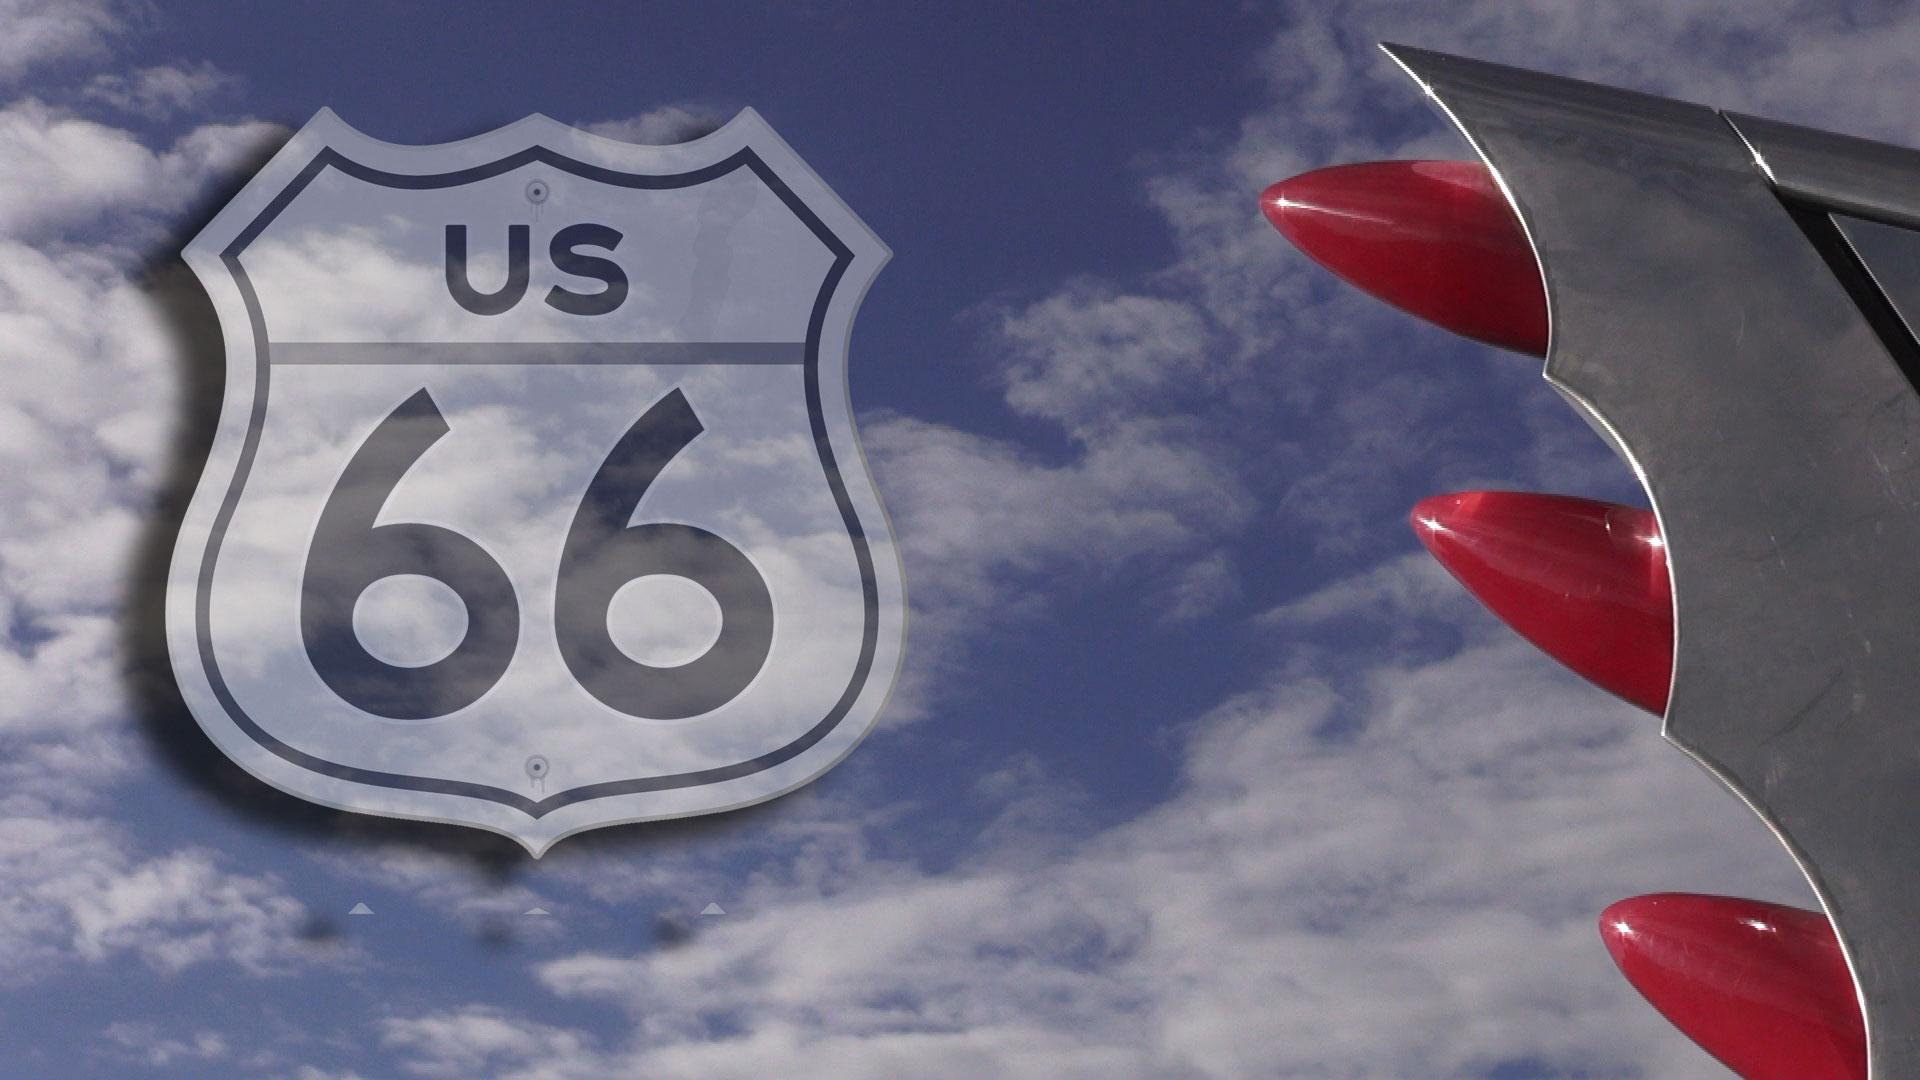 Babettes RoadMovie Route 66 USA